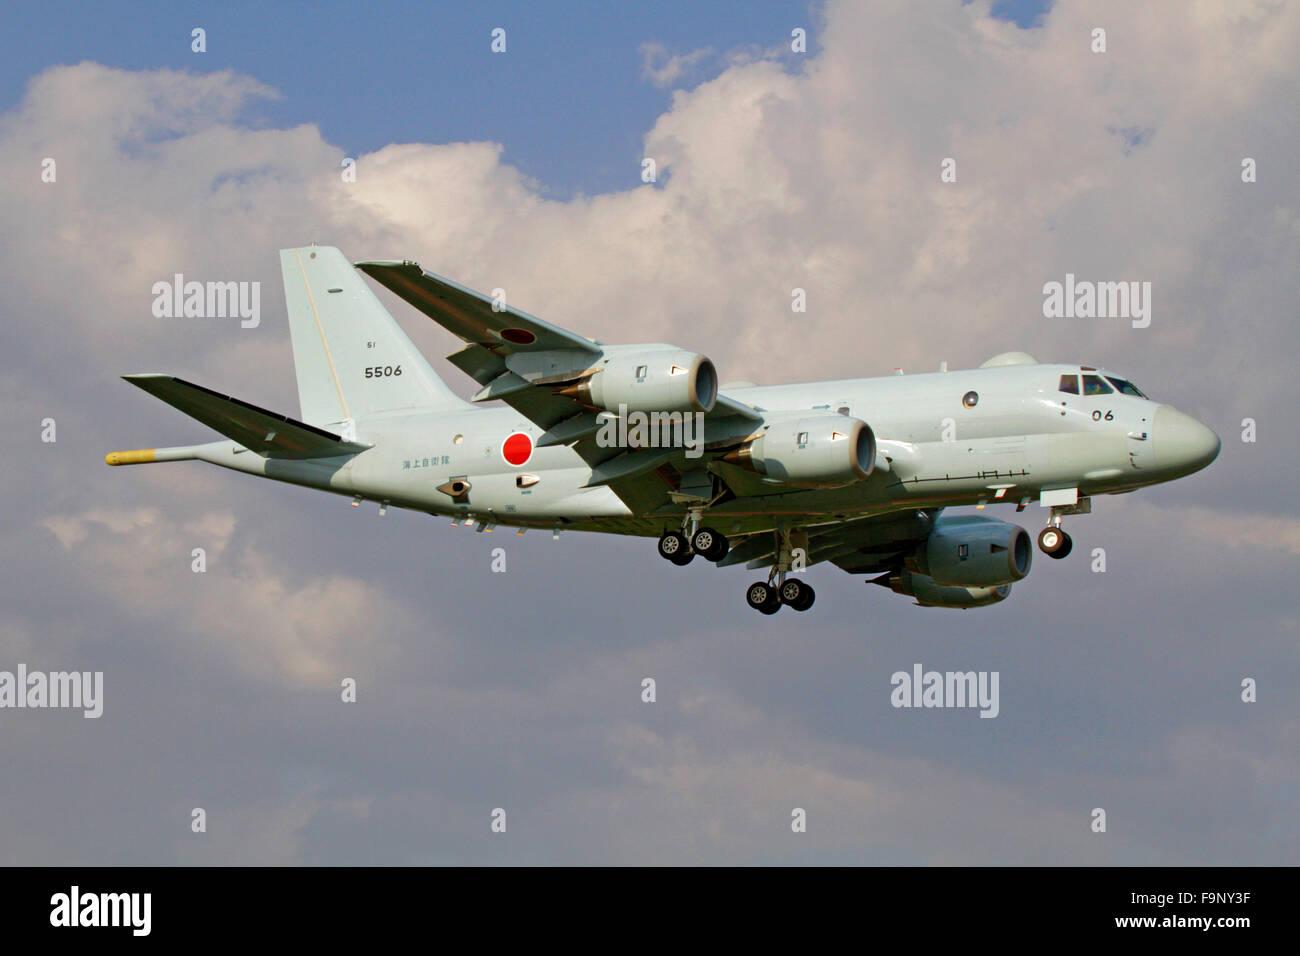 The Kawasaki P-1 maritime patrol aircraft of JMSDF - Stock Image